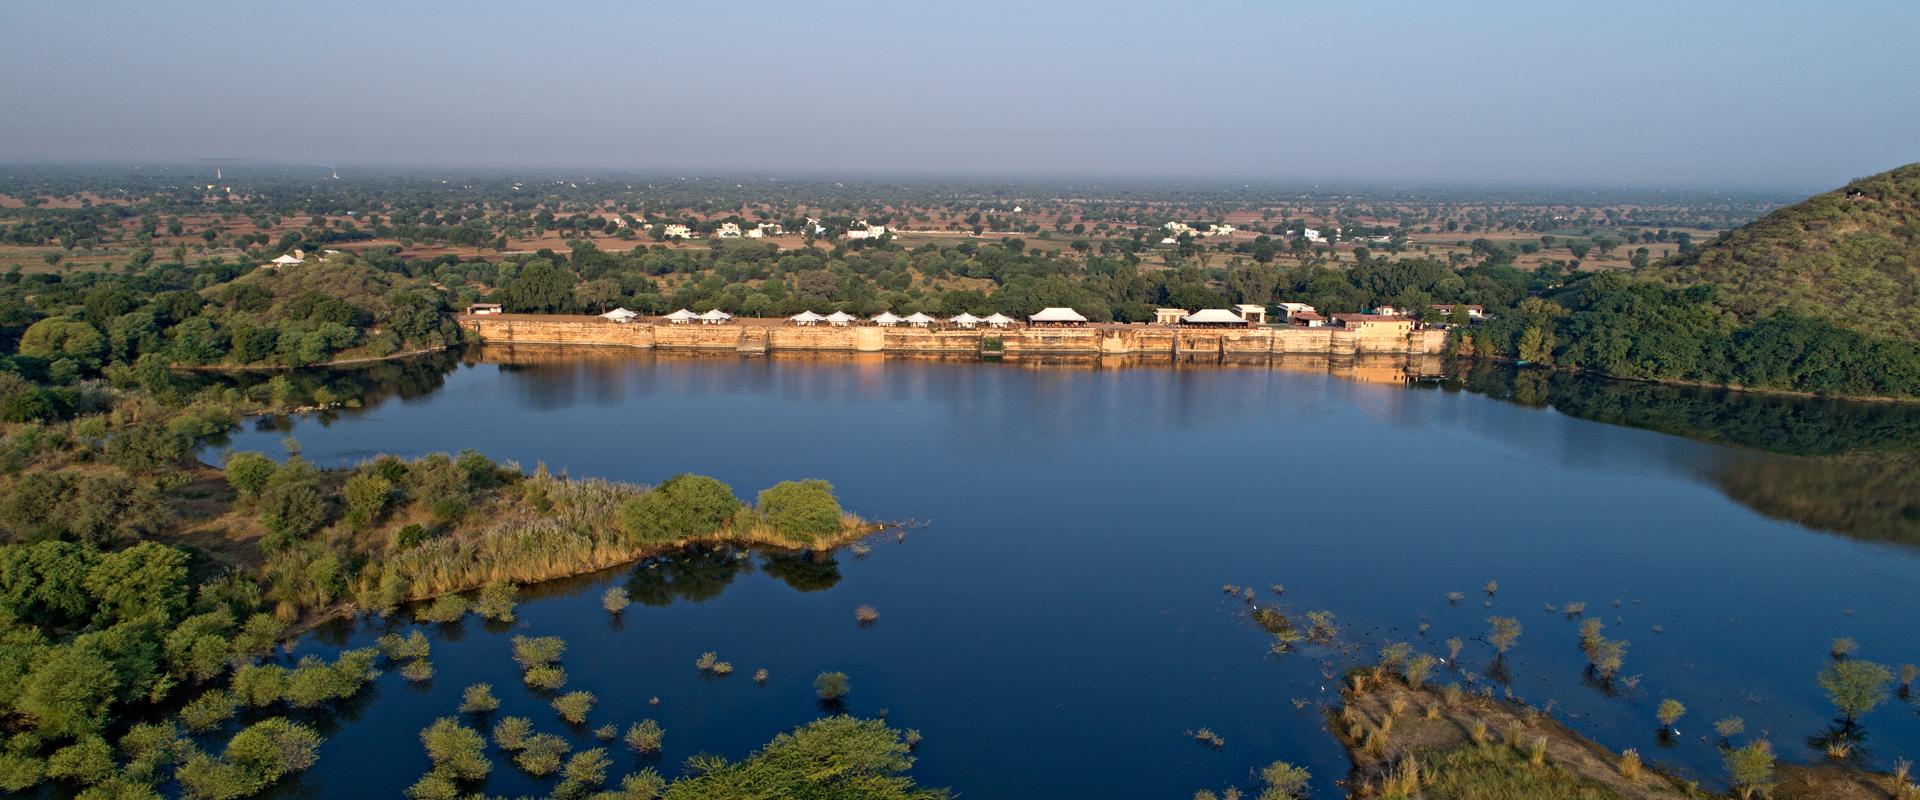 Chhatra Sagar Camp